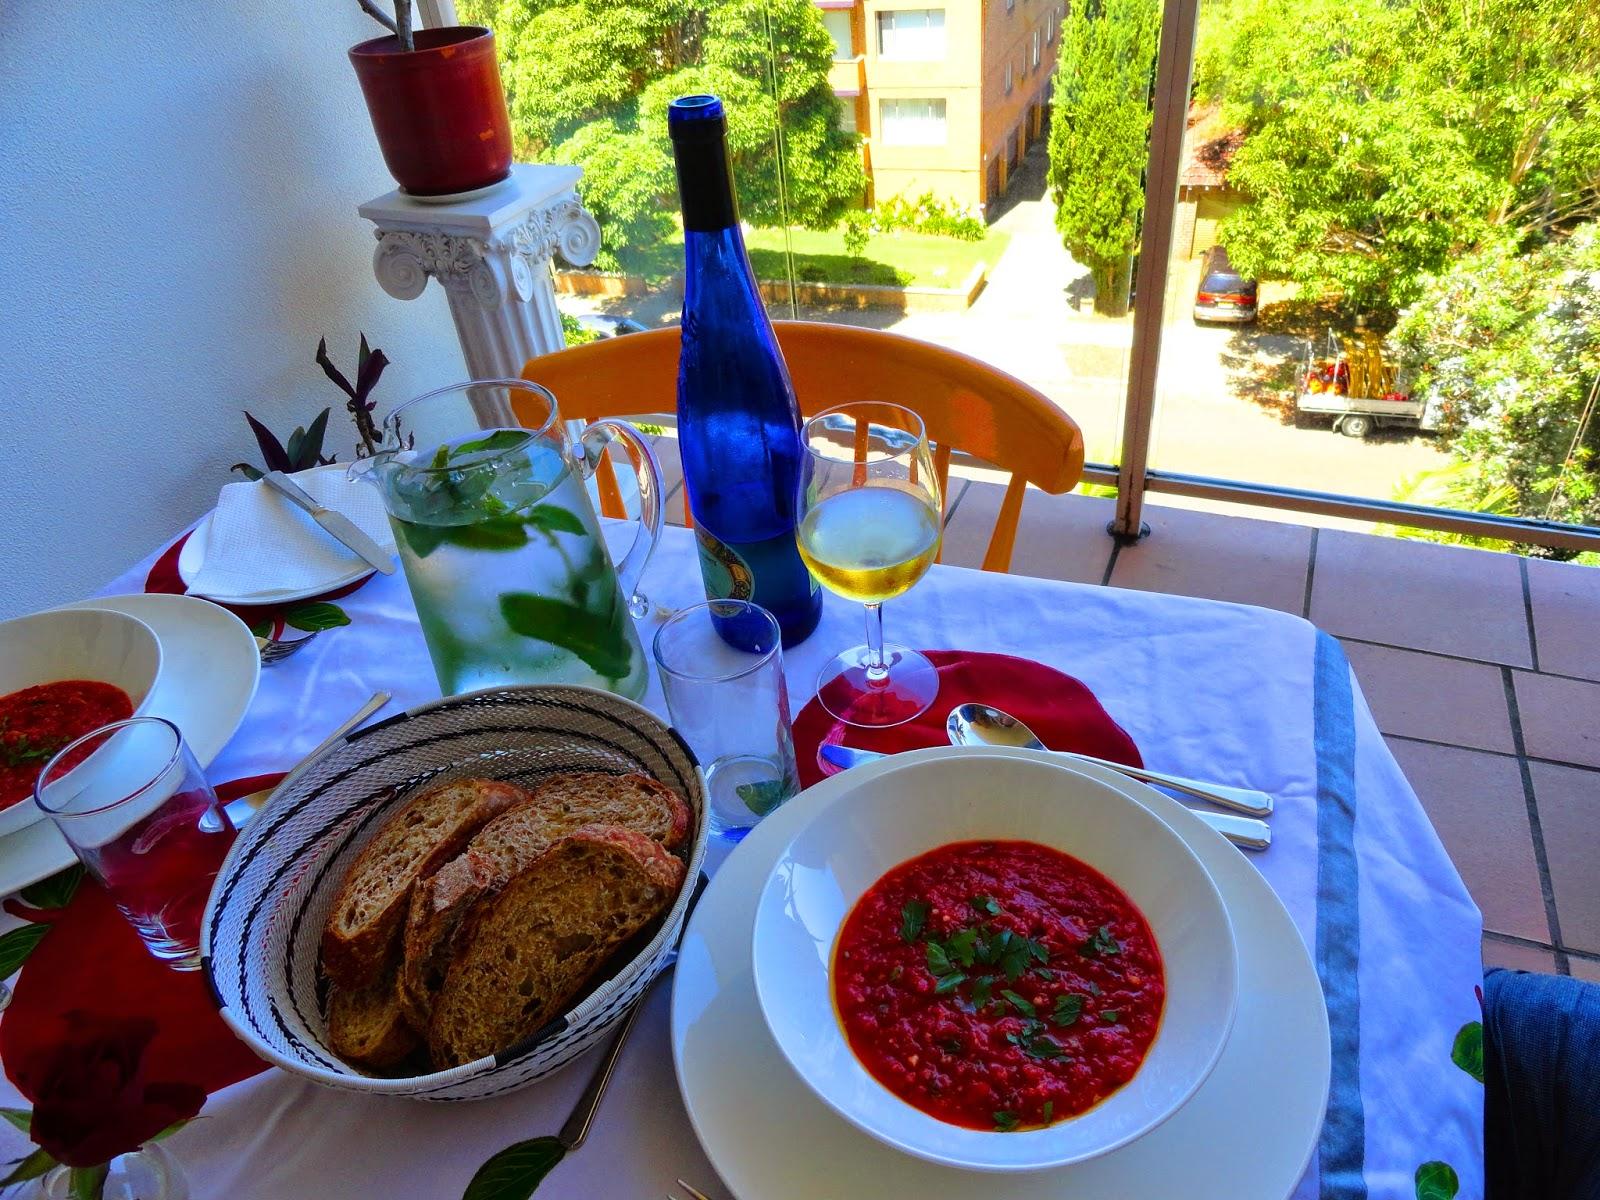 gazpacho delicious cold soup